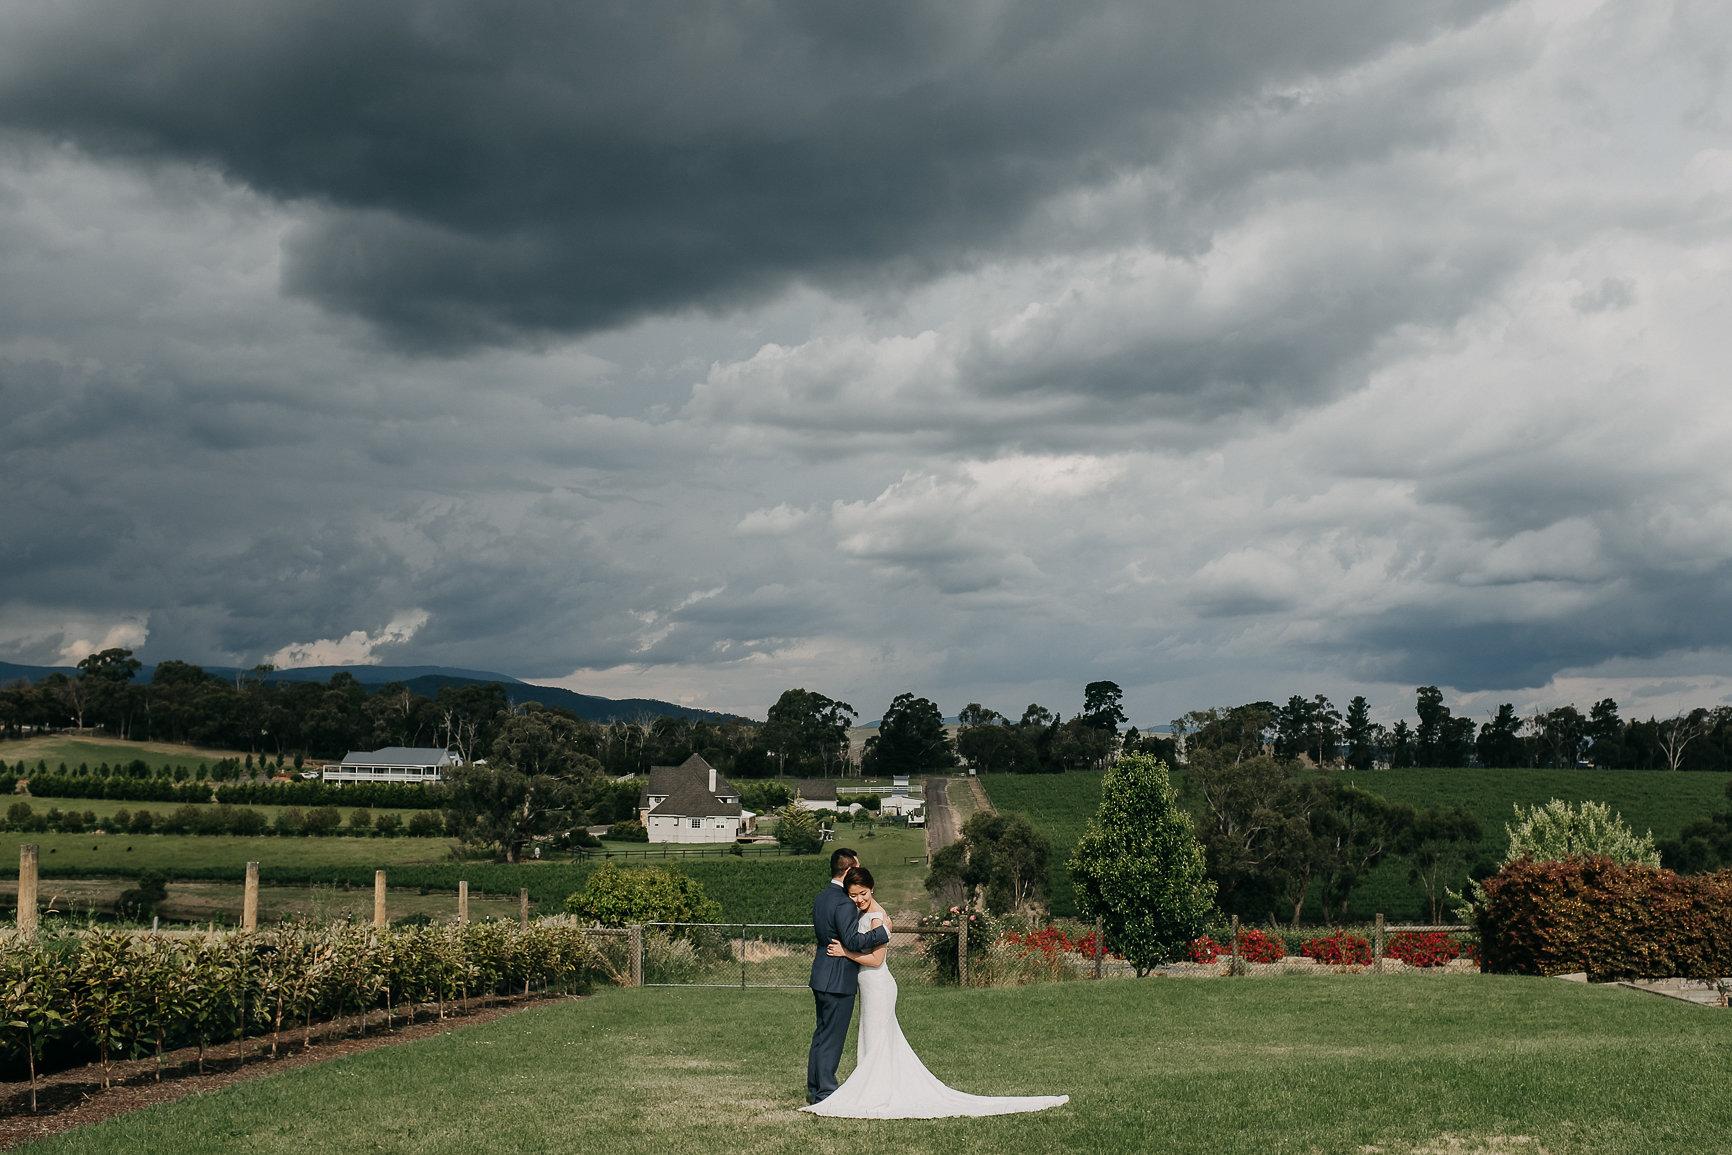 Sydney Wedding Photography Vines Helen's Hill Restaurant  St Peter and Paul's Church - 011.jpg